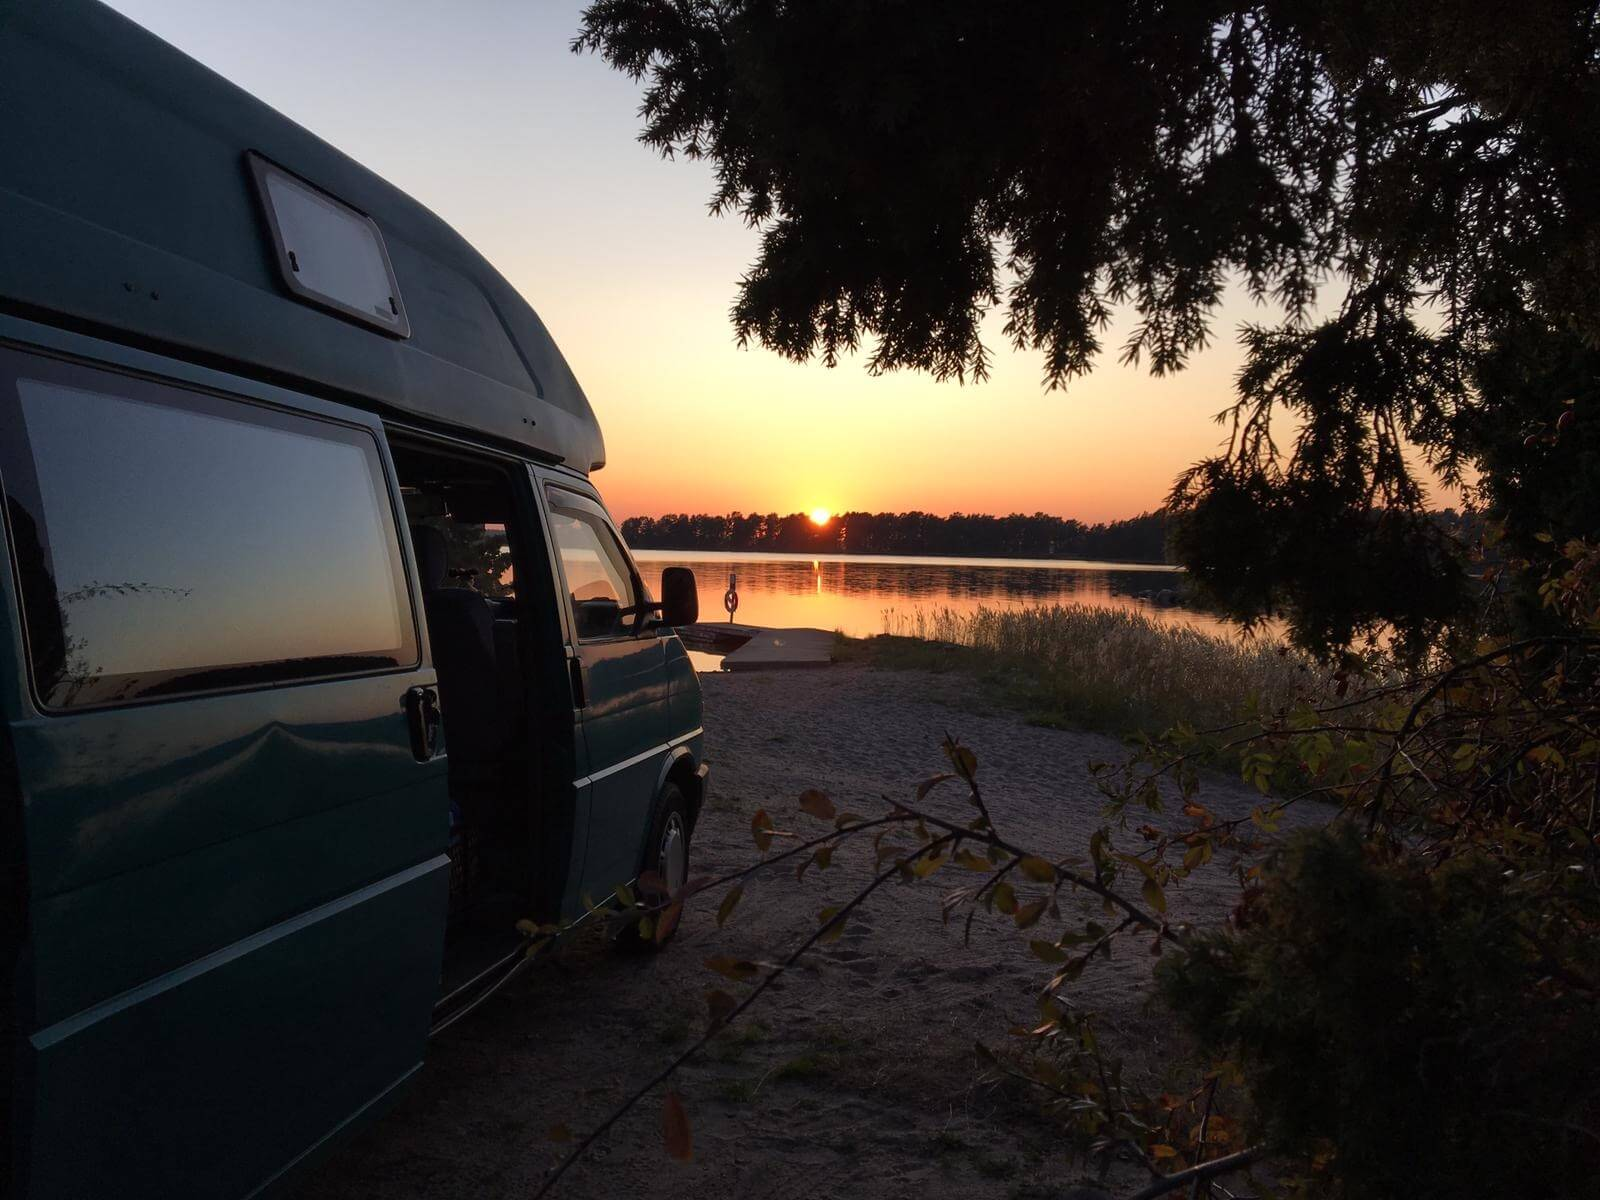 VW Bus T4 Manfred California gruen Camper Bulli mieten Rostock bincampen Sonnenuntergang Sommer See Natur